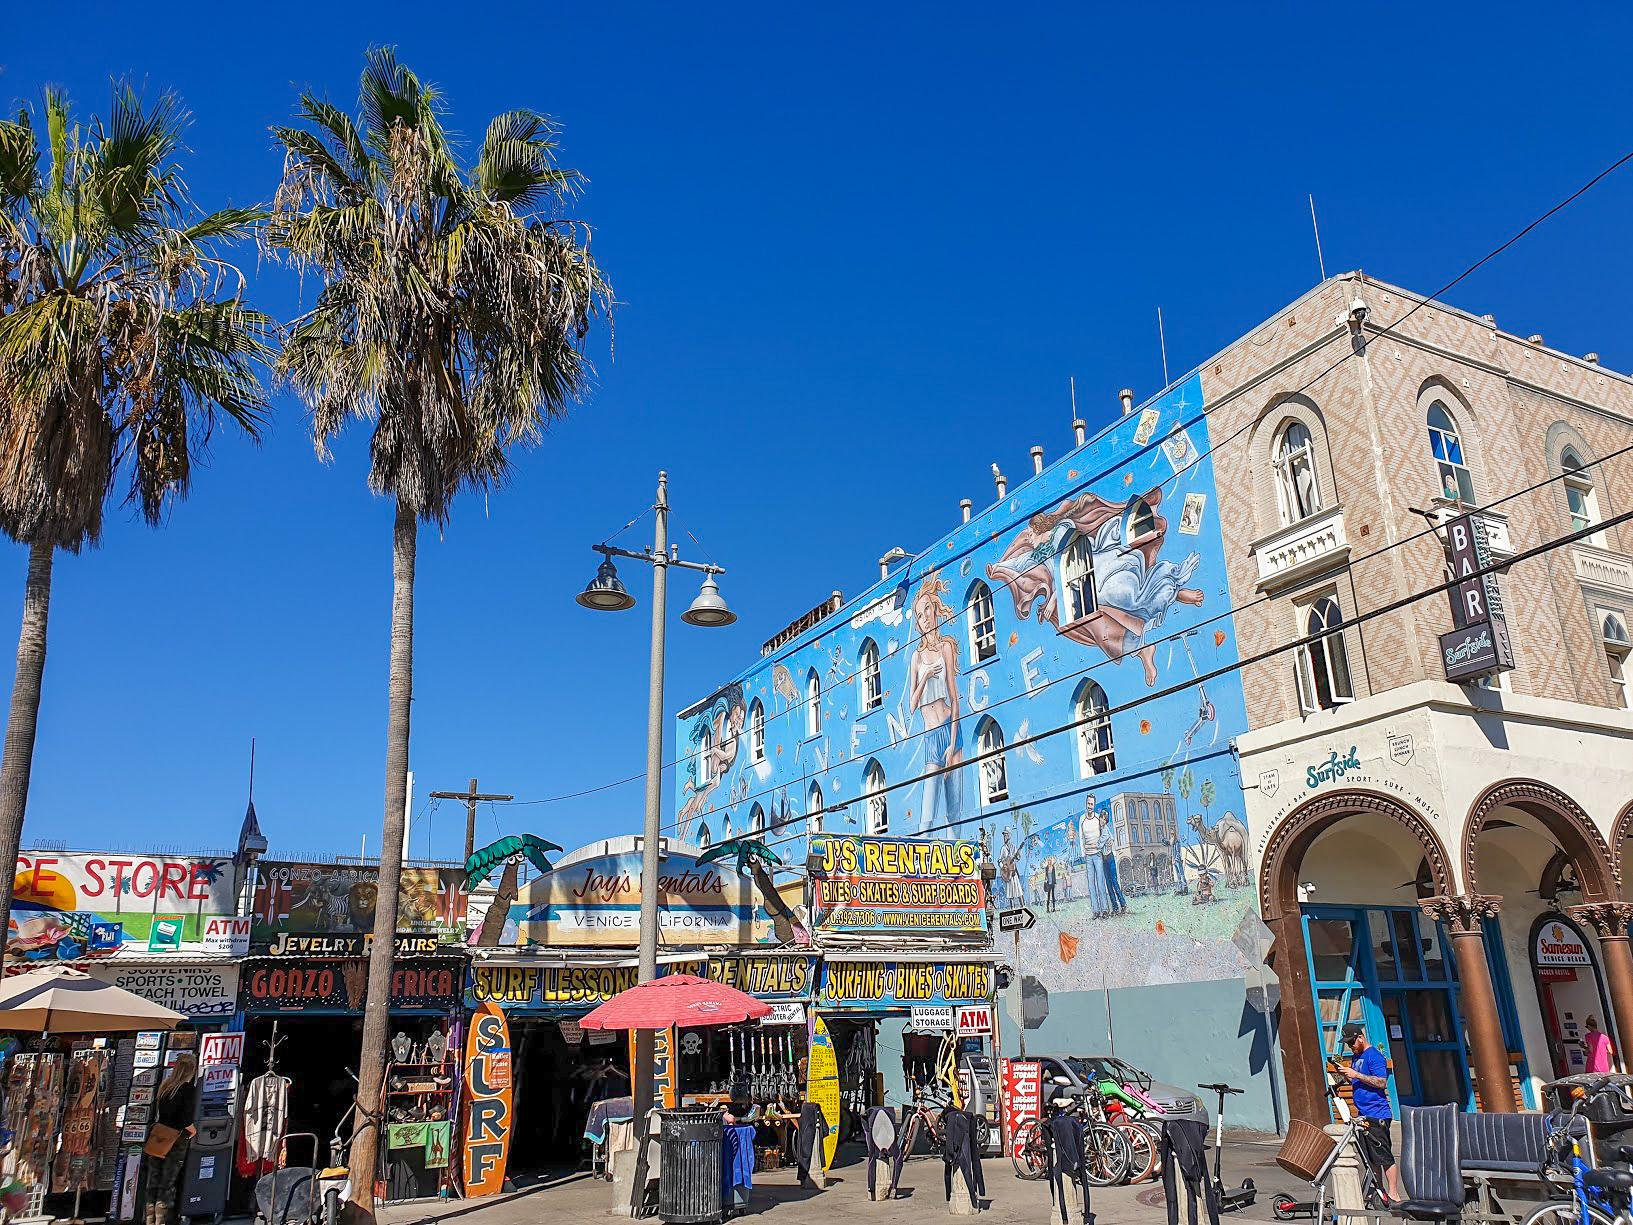 Venice Kenesis mural on a building in Venice Beach, Los Angeles